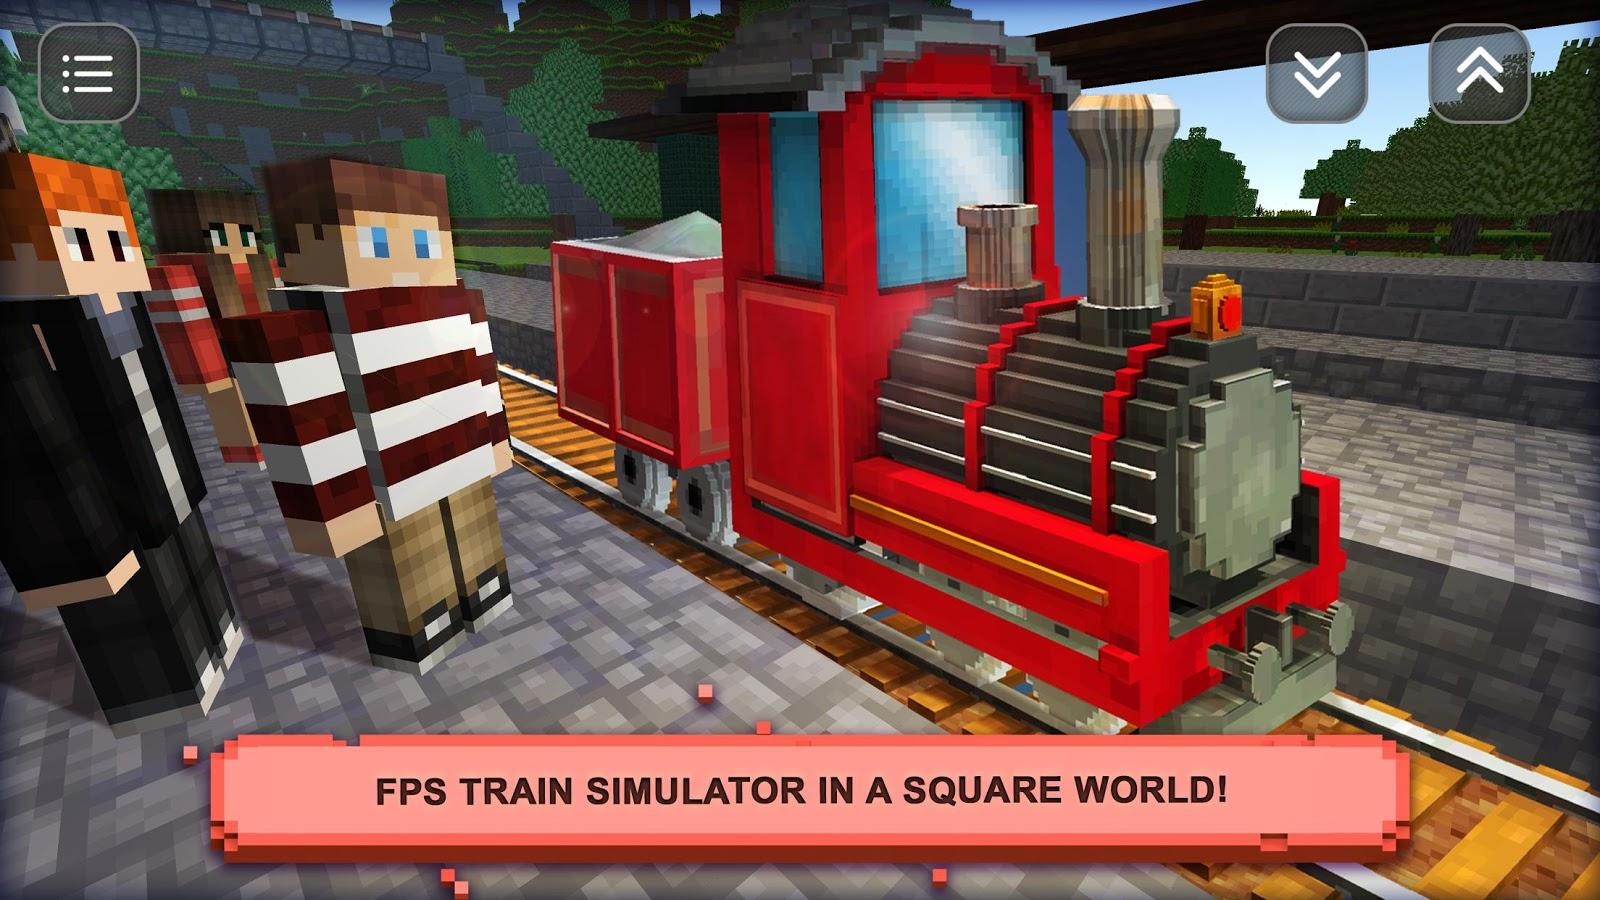 Railroad Building Puzzle Game Online - Derailed